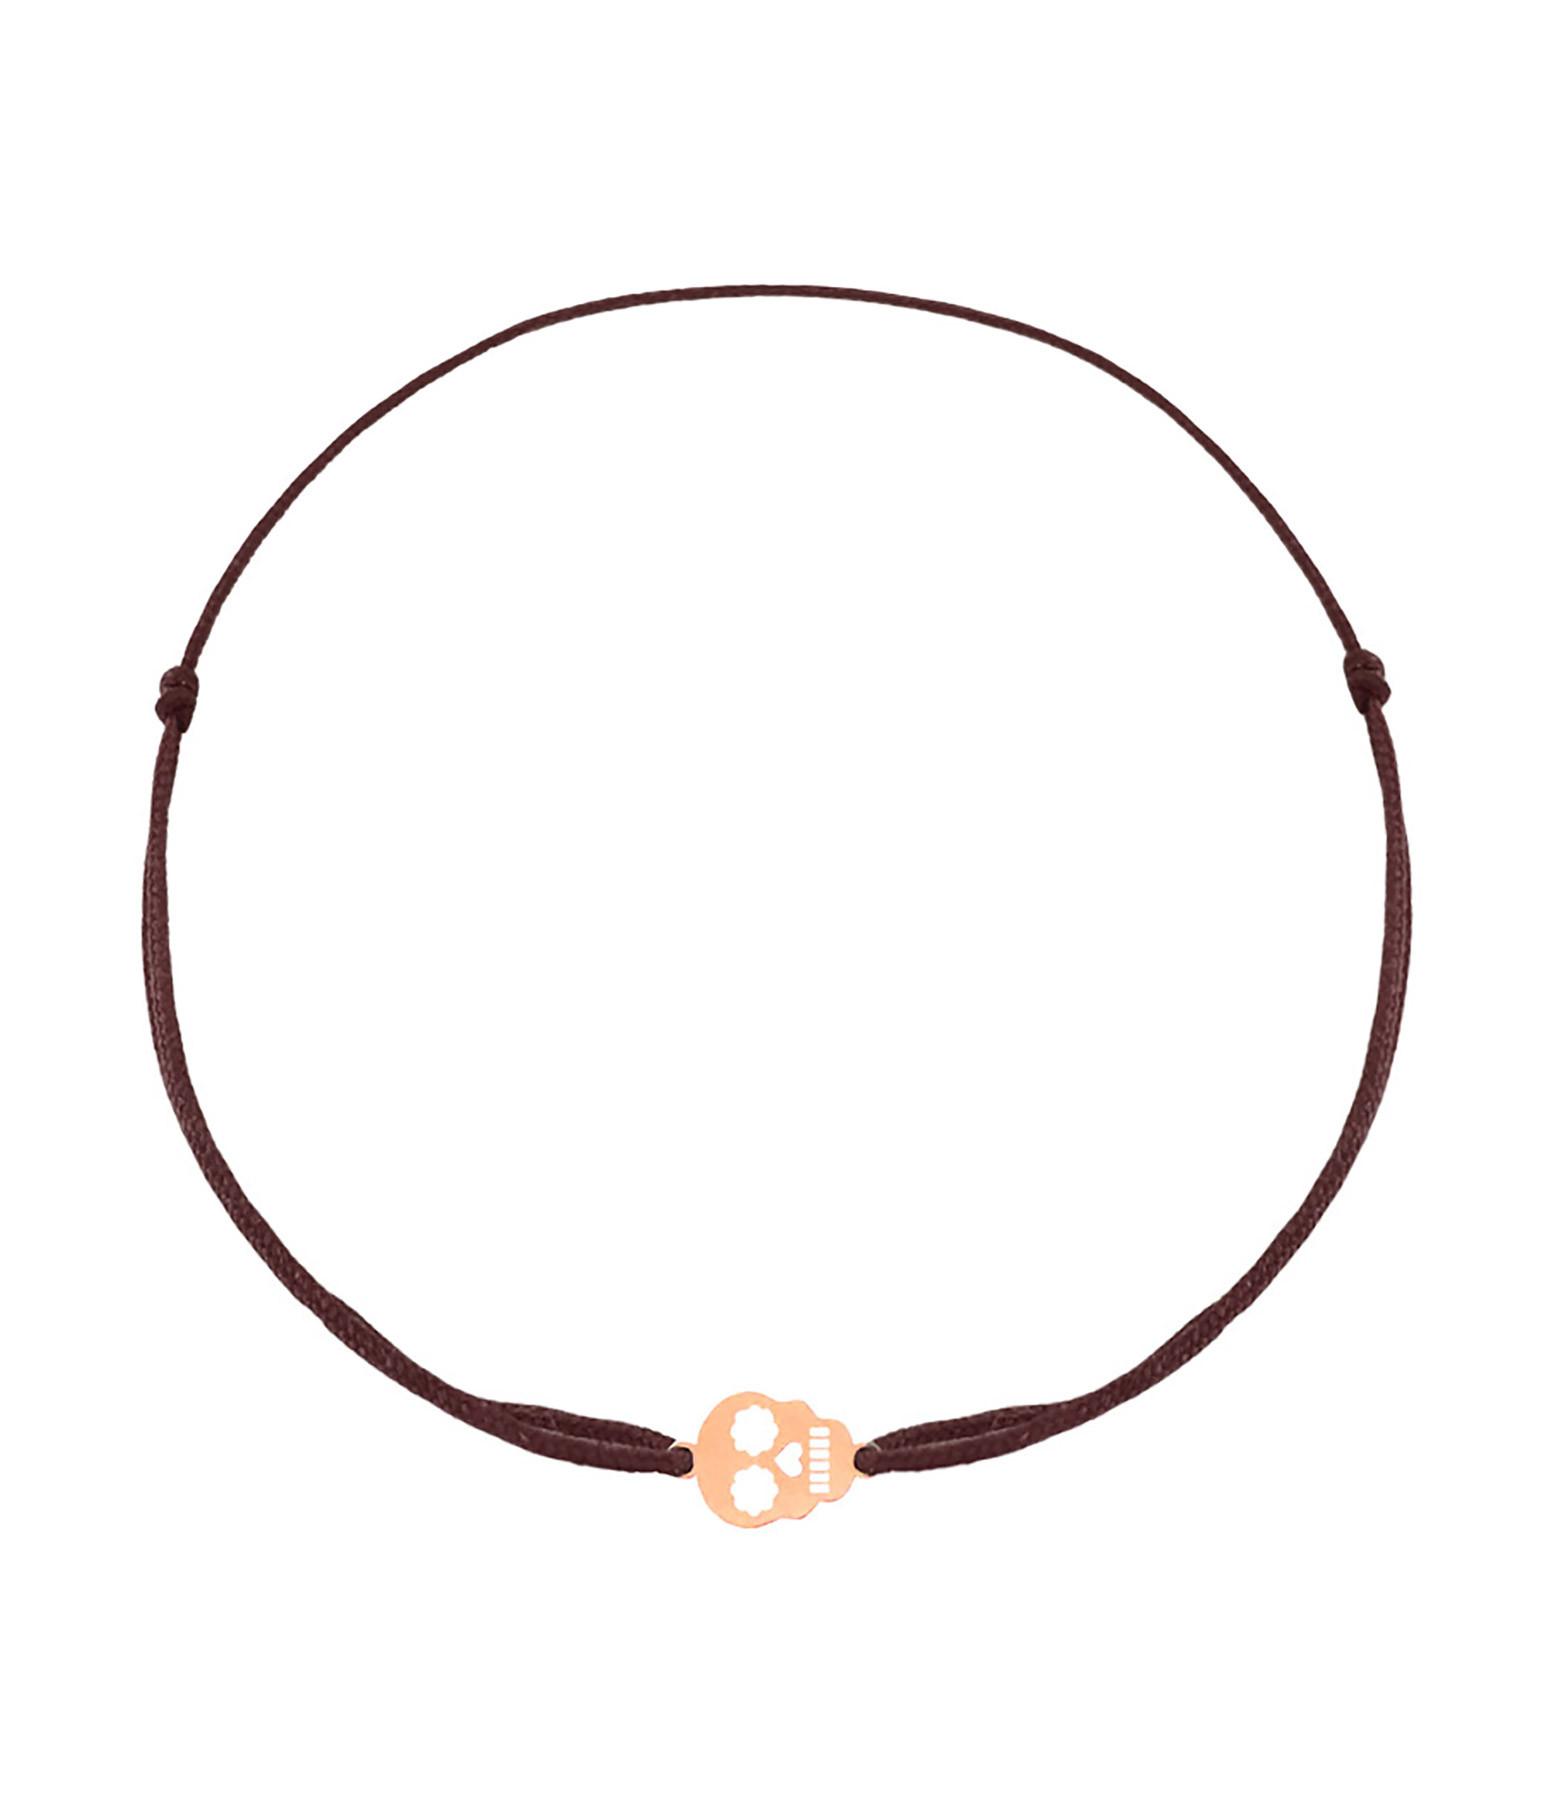 CHIBCHA - Bracelet Cordon La Catrina